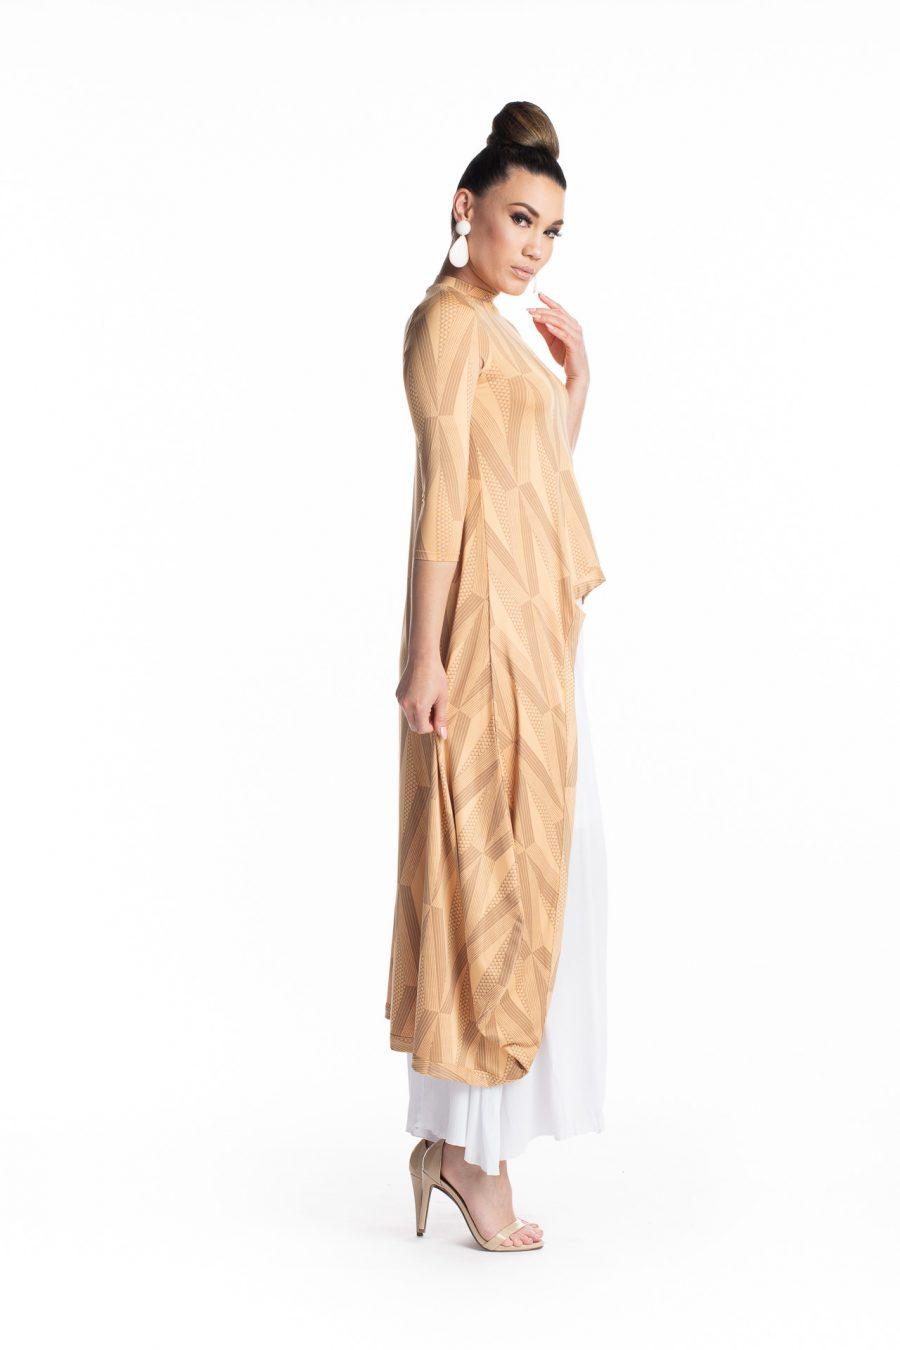 Female model wearing the Kalu Kalu Hi Low Dress in Clay Tannin - Side View